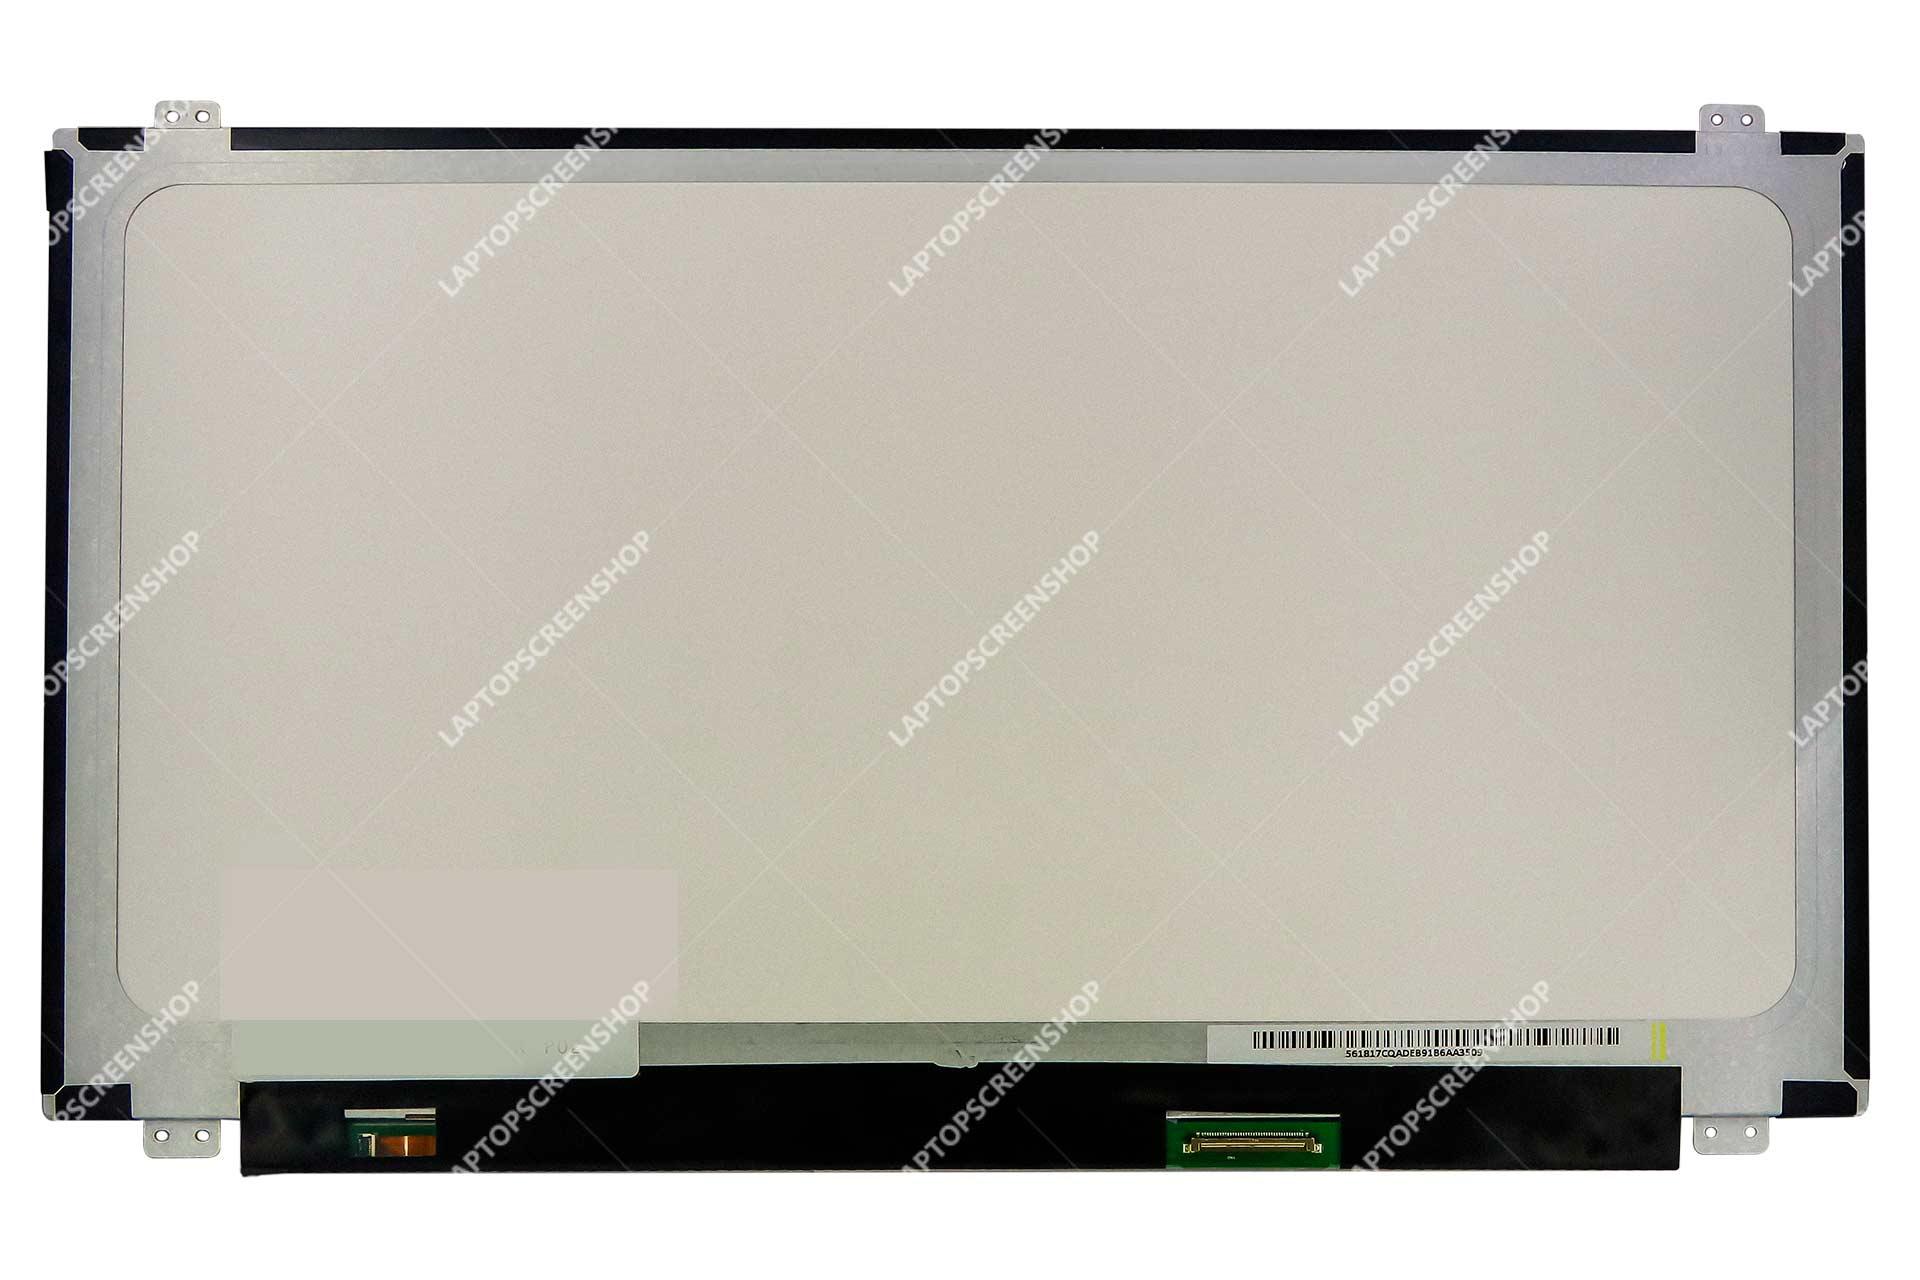 SONY-VAIO-SVS1511C5E-LCD |FHD|فروشگاه لپ تاپ اسکرين | تعمير لپ تاپ